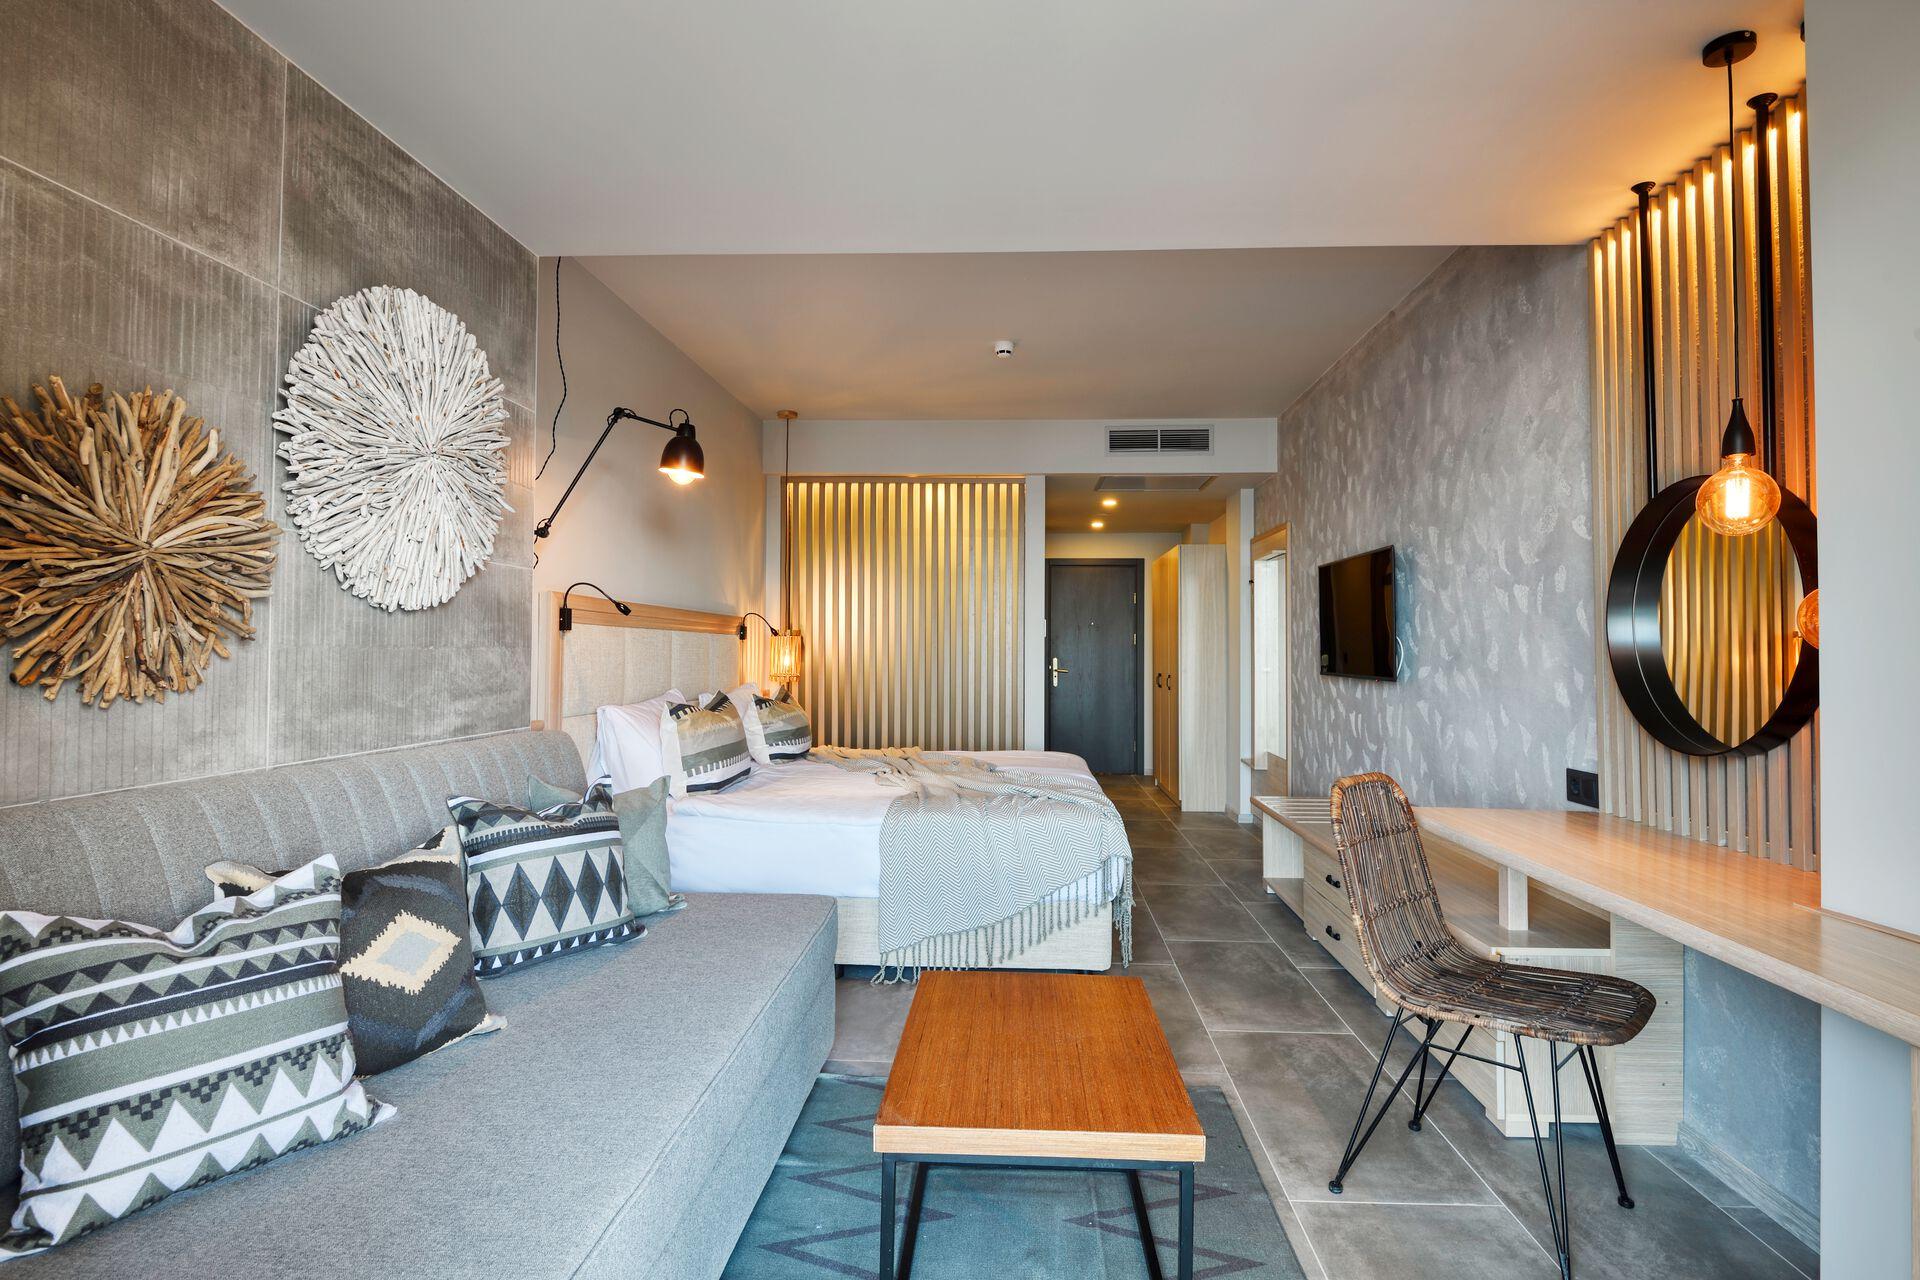 Bulgarie - Grifid Hotel Vistamar 4*